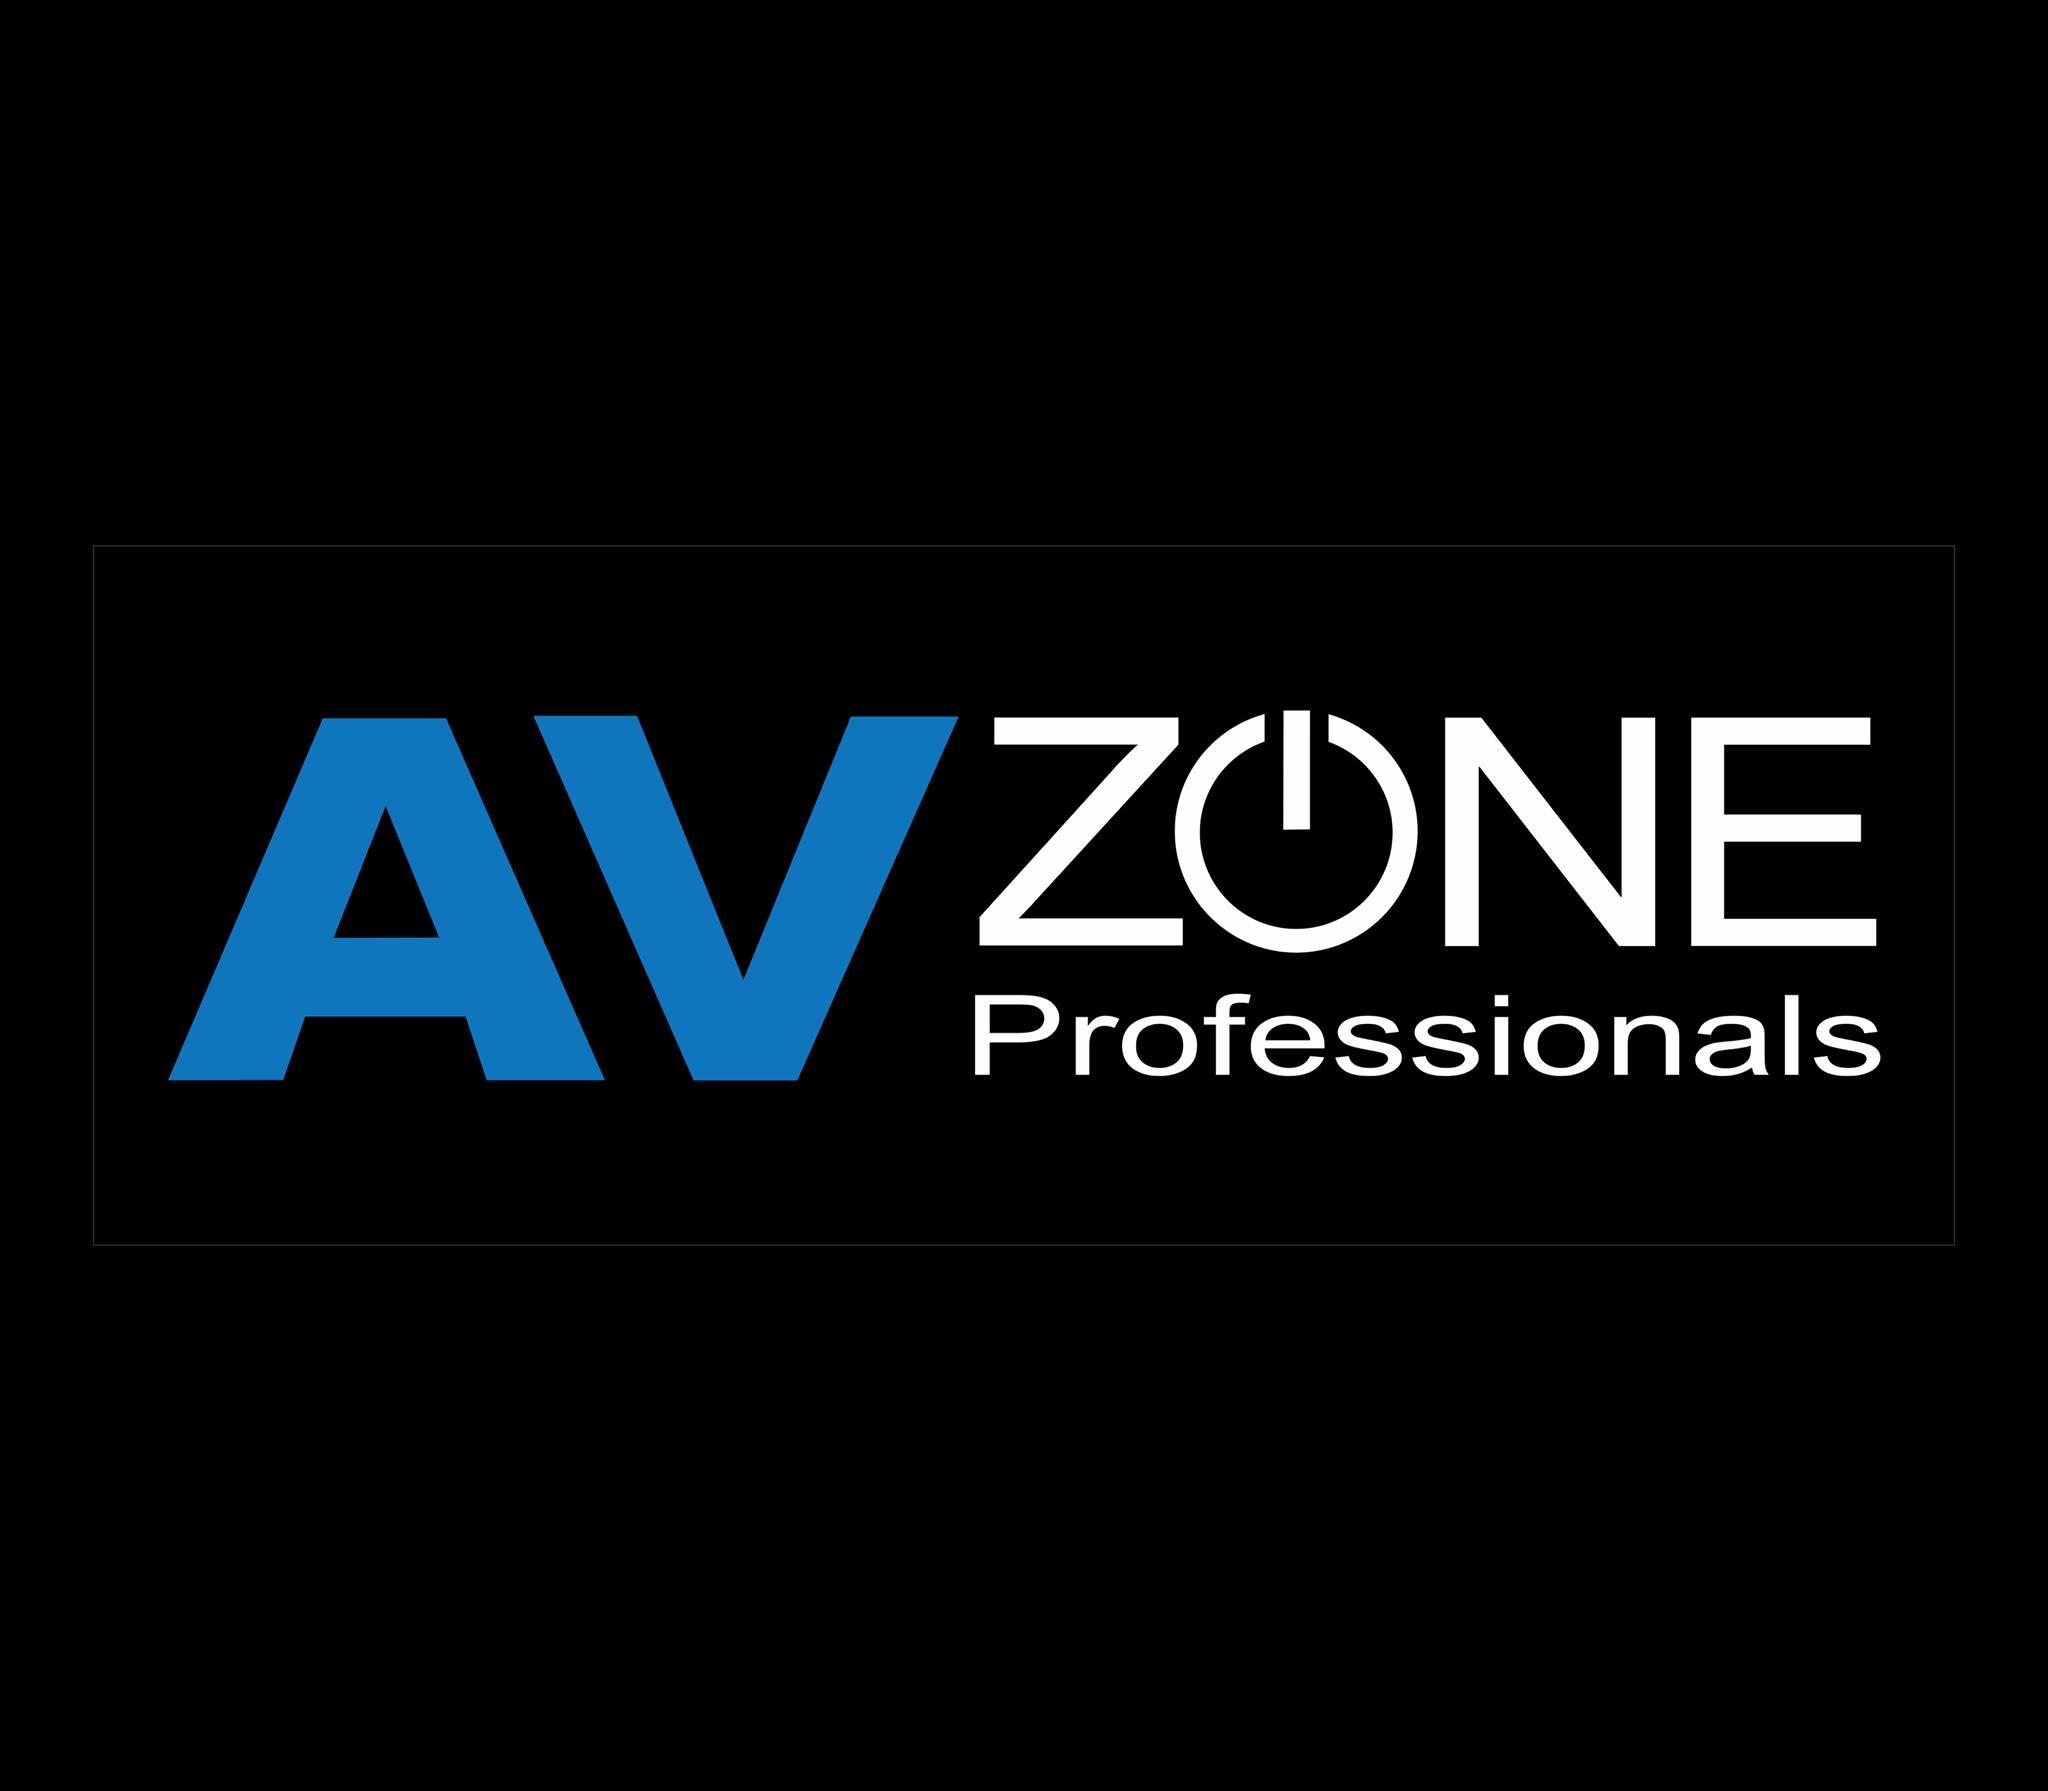 AV Zone Professionals